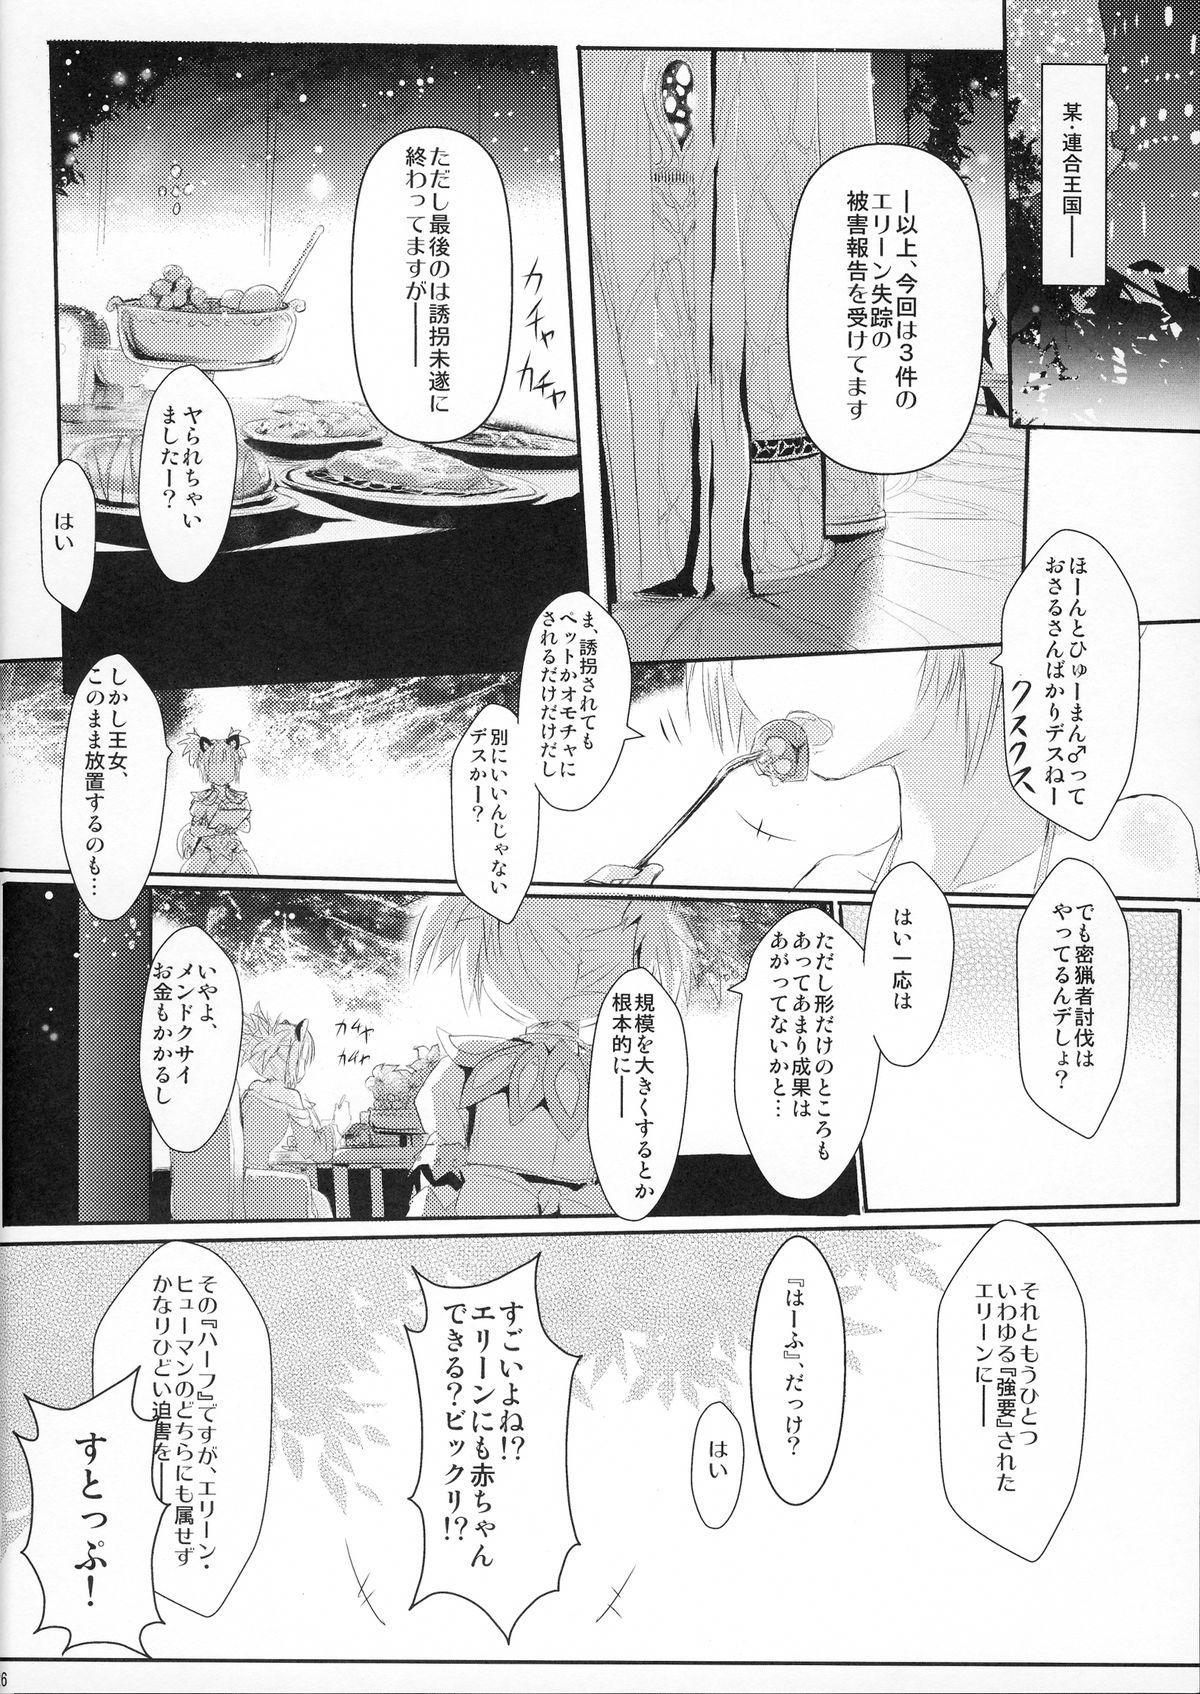 [Mirukomi (PRIMIL)] Human wa Erin-chan ni Hidoi Koto Shitai yo ne - ELIN's the best - (TERA The Exiled Realm of Arborea) 25